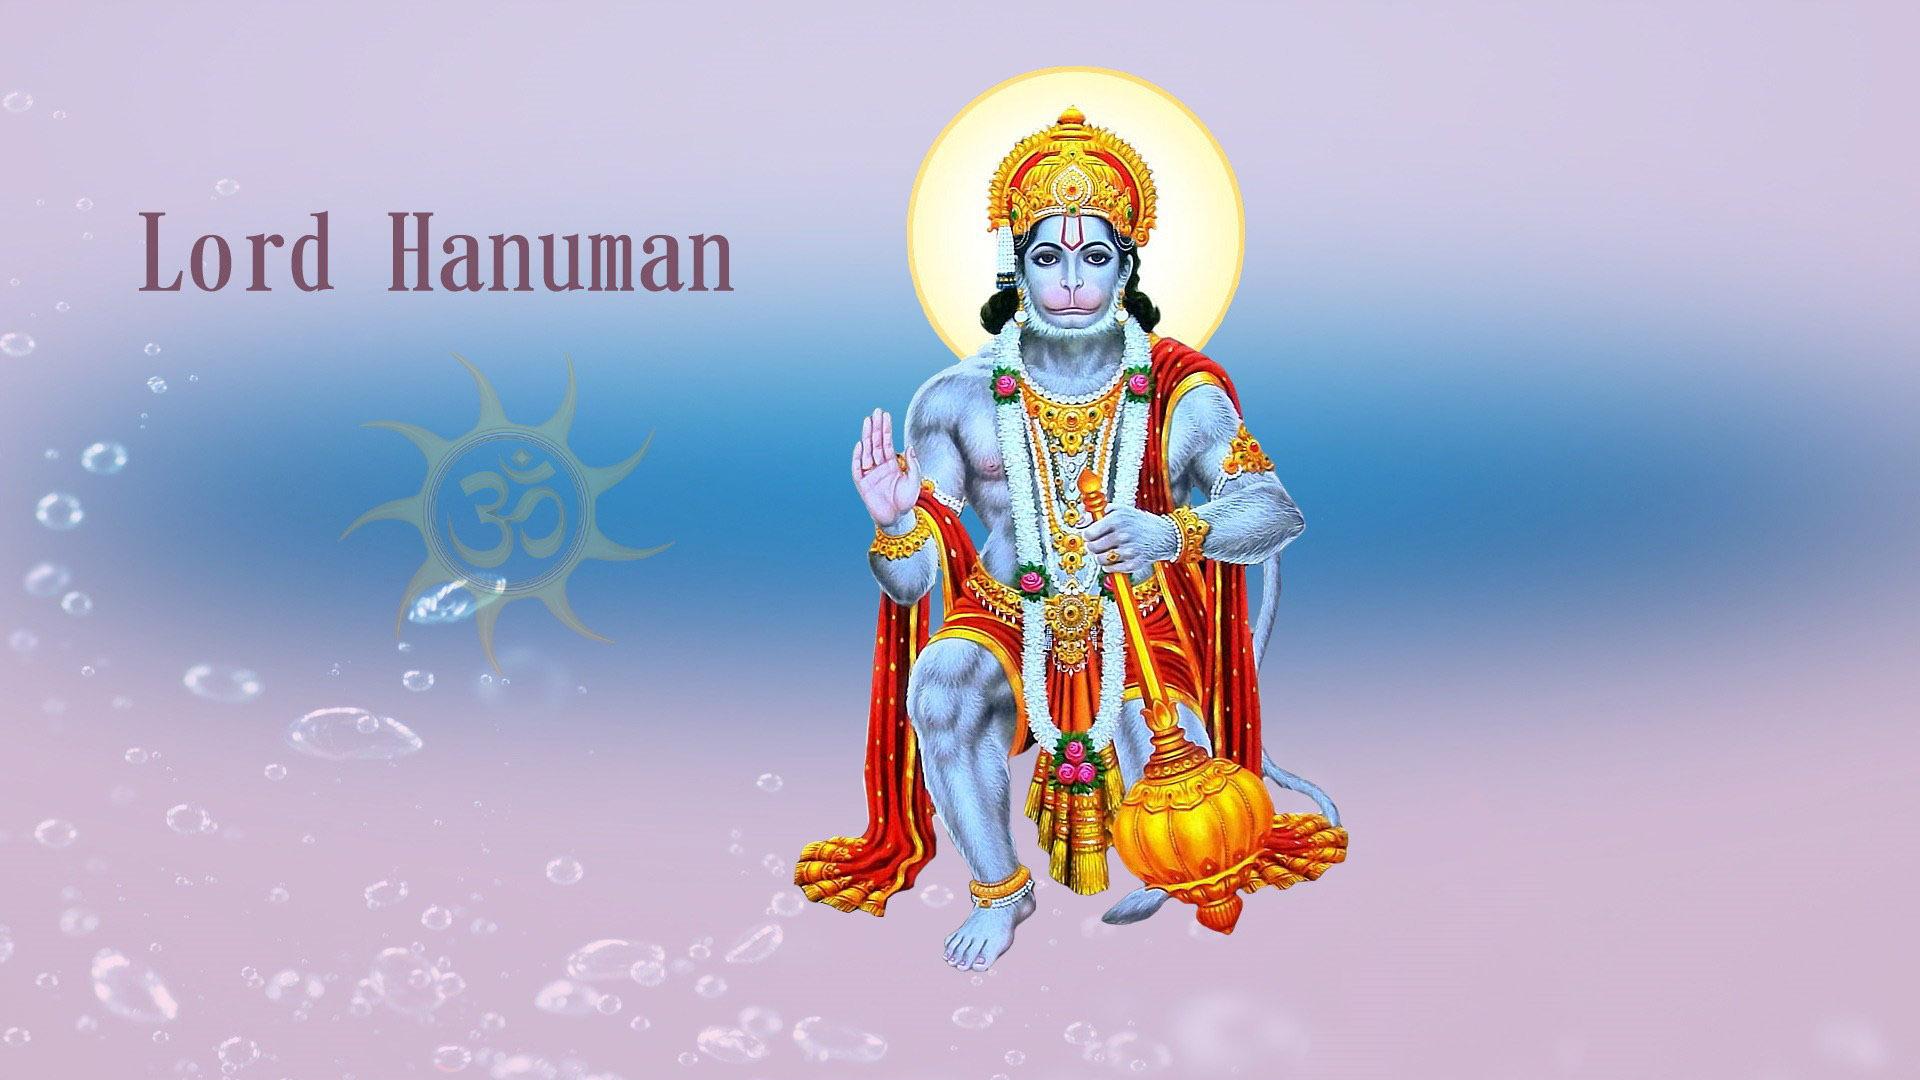 hanuman ji facts cover picture